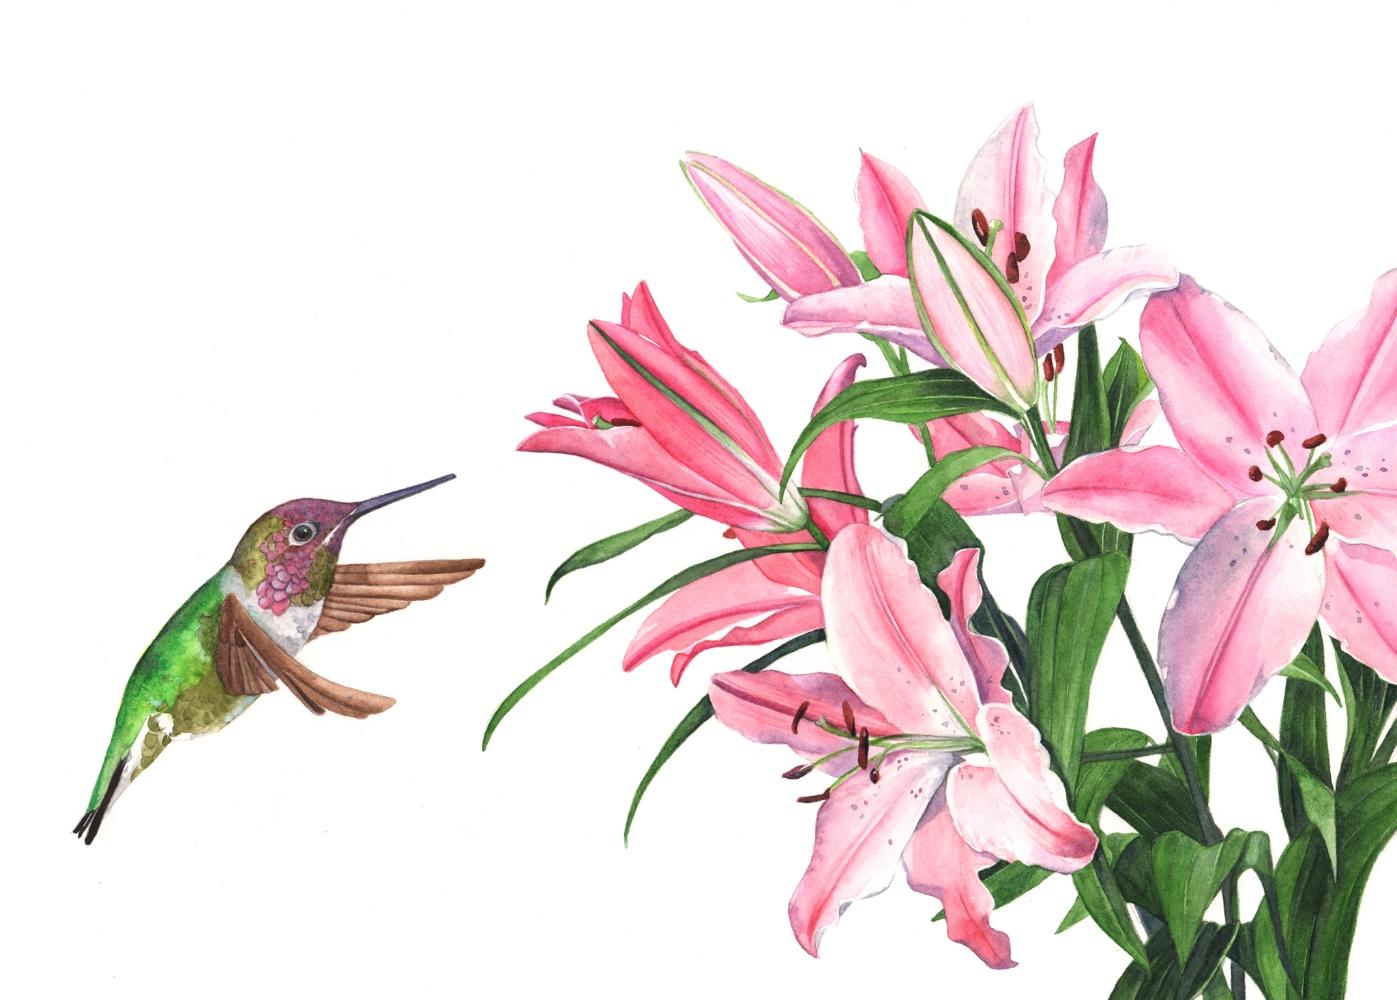 Hummingbird with lilies Louise De Masi